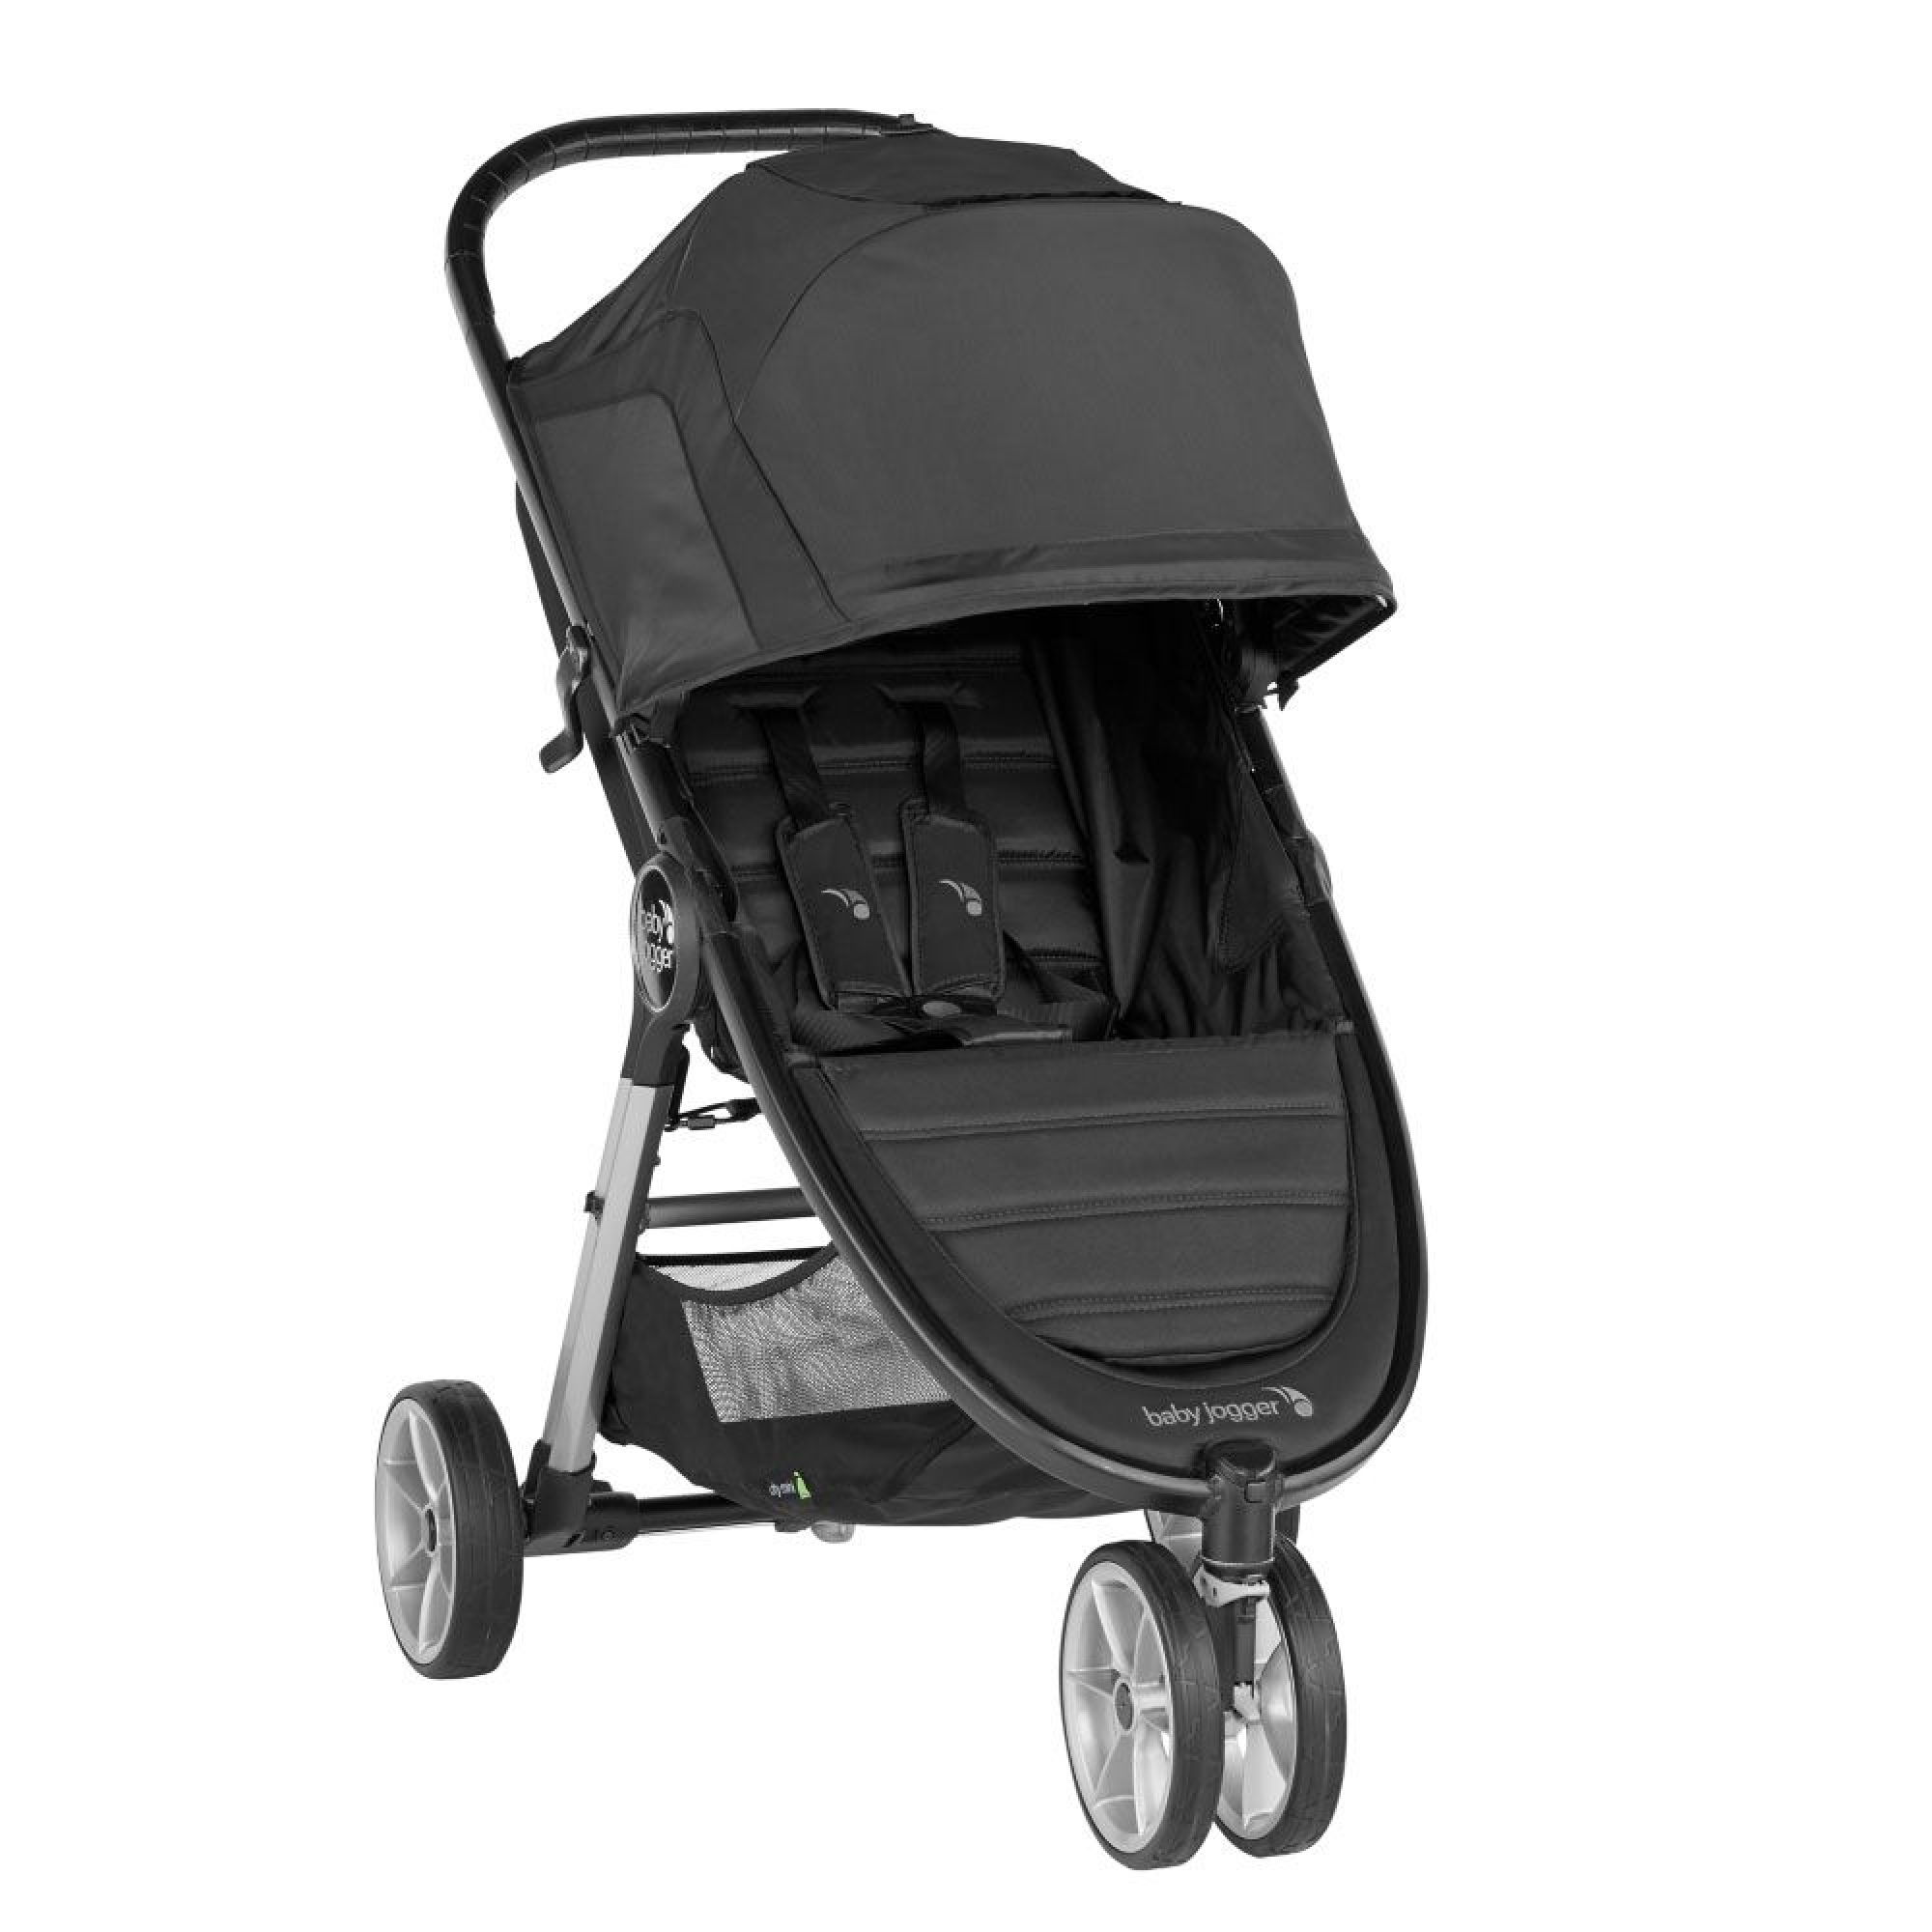 Baby Jogger City Mini 2 Plus Accessories Jet Smart Kid Store